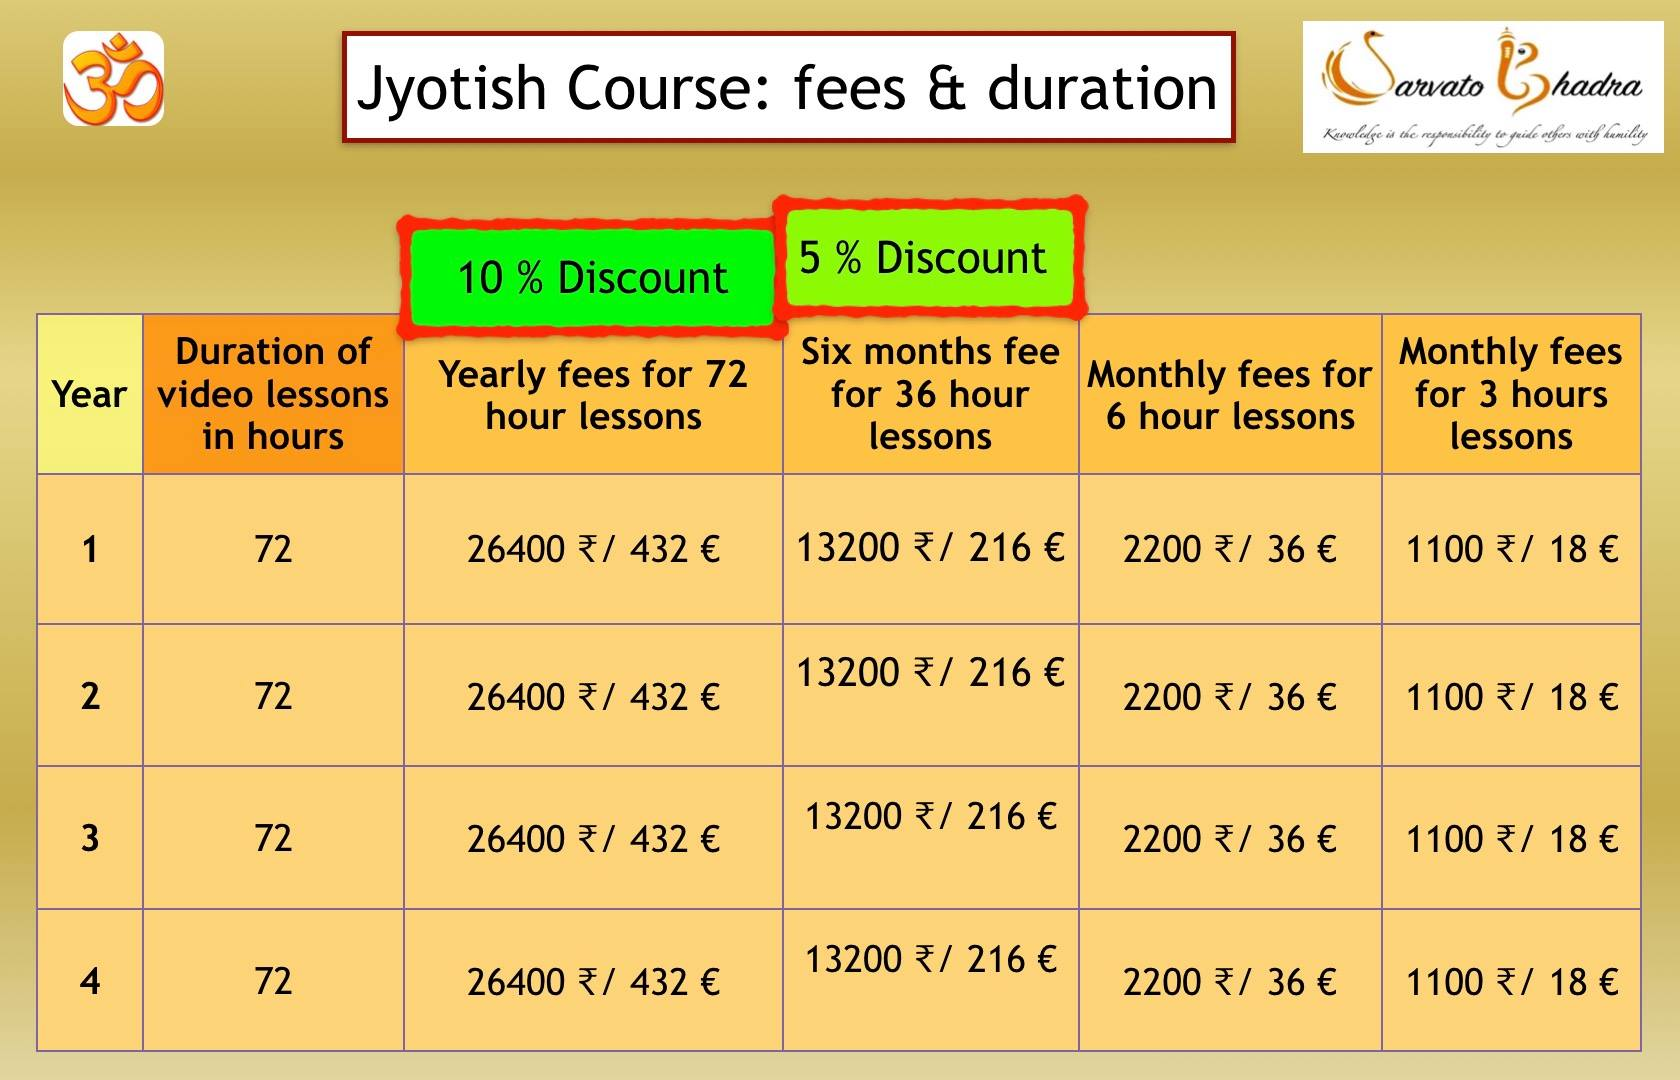 Sarvatobhadra jyotish course